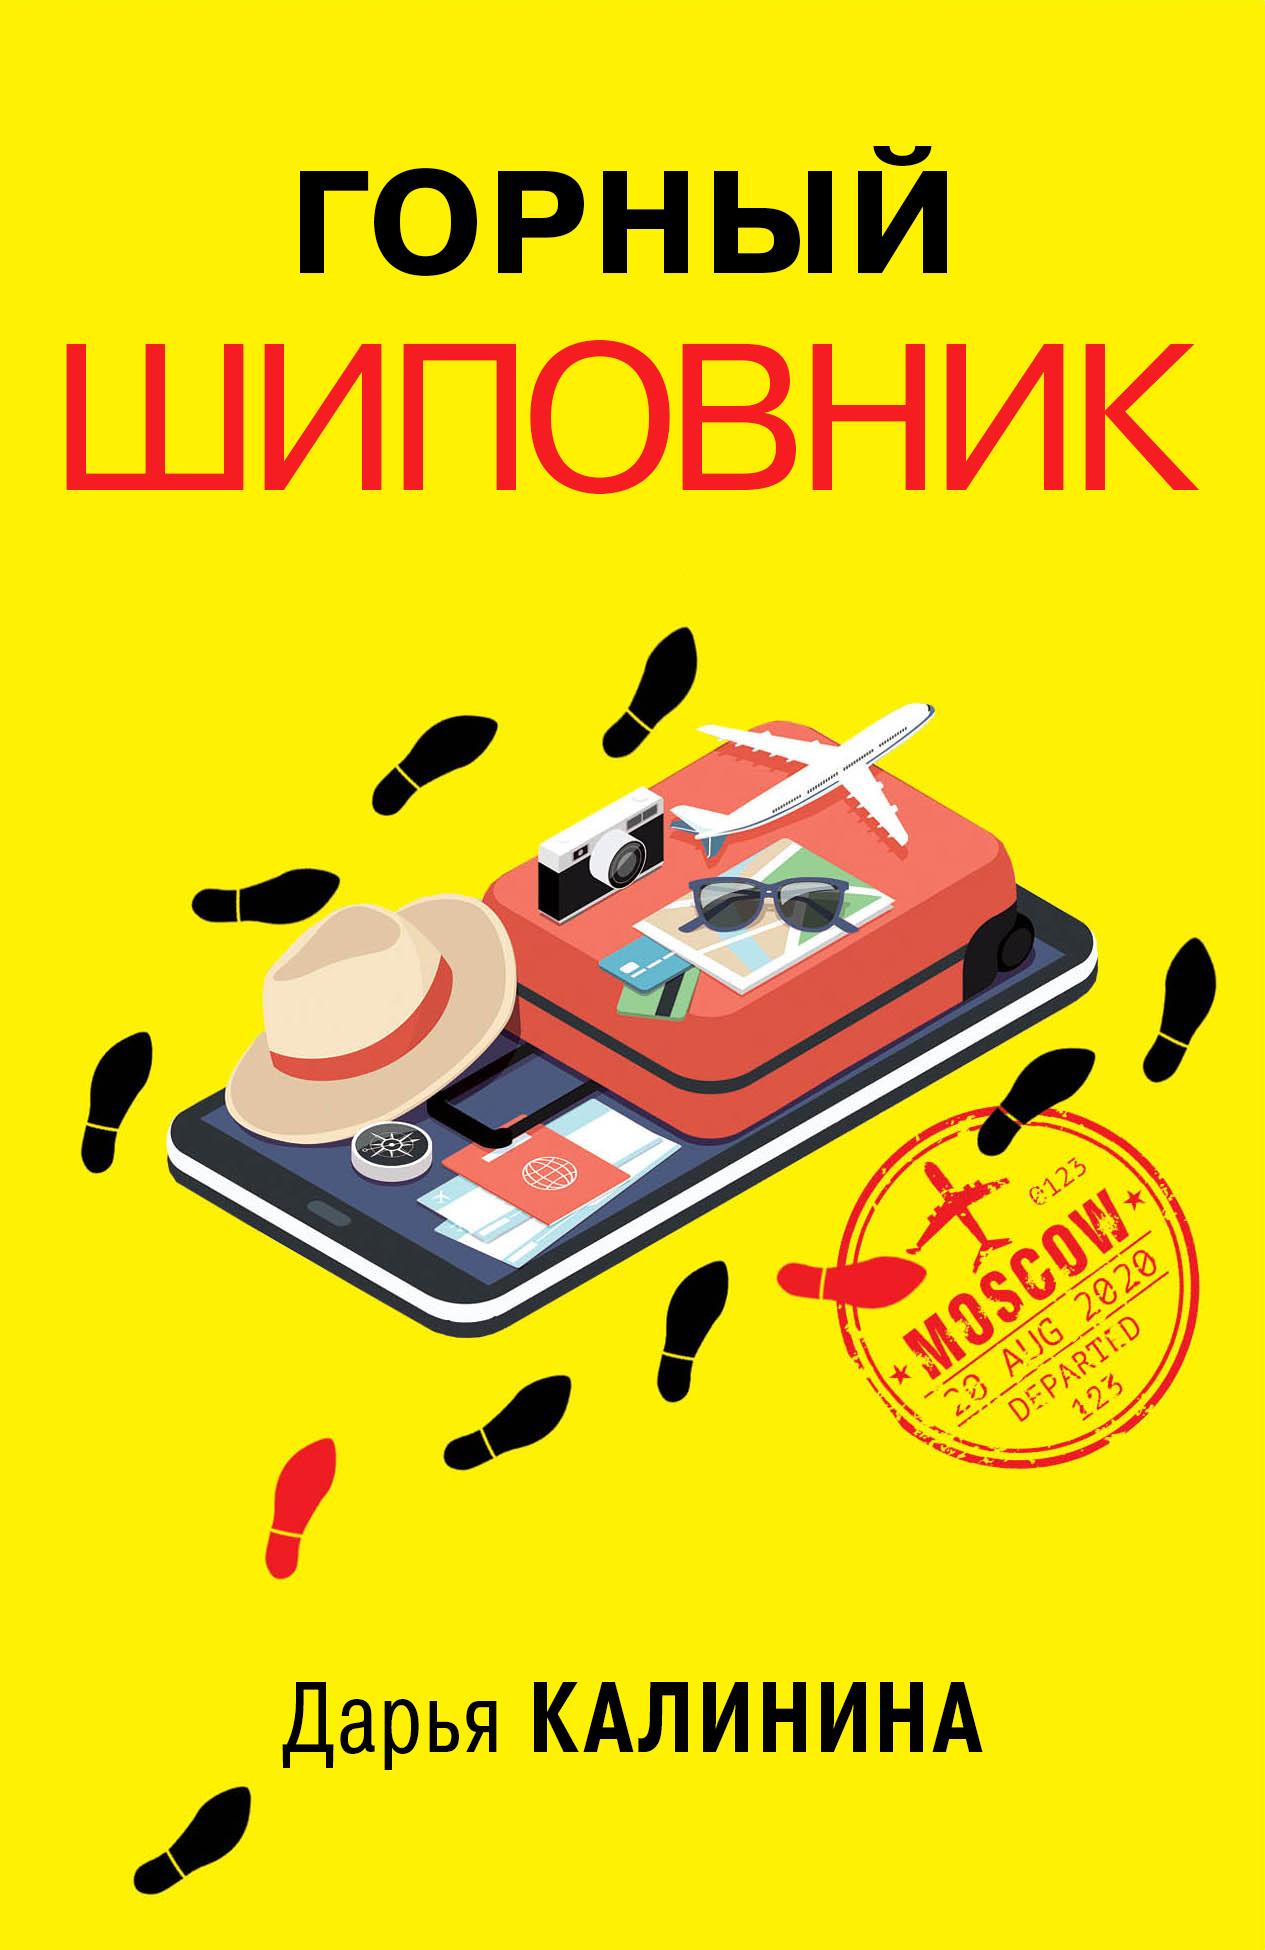 Дарья Калинина Горный шиповник тарифный план